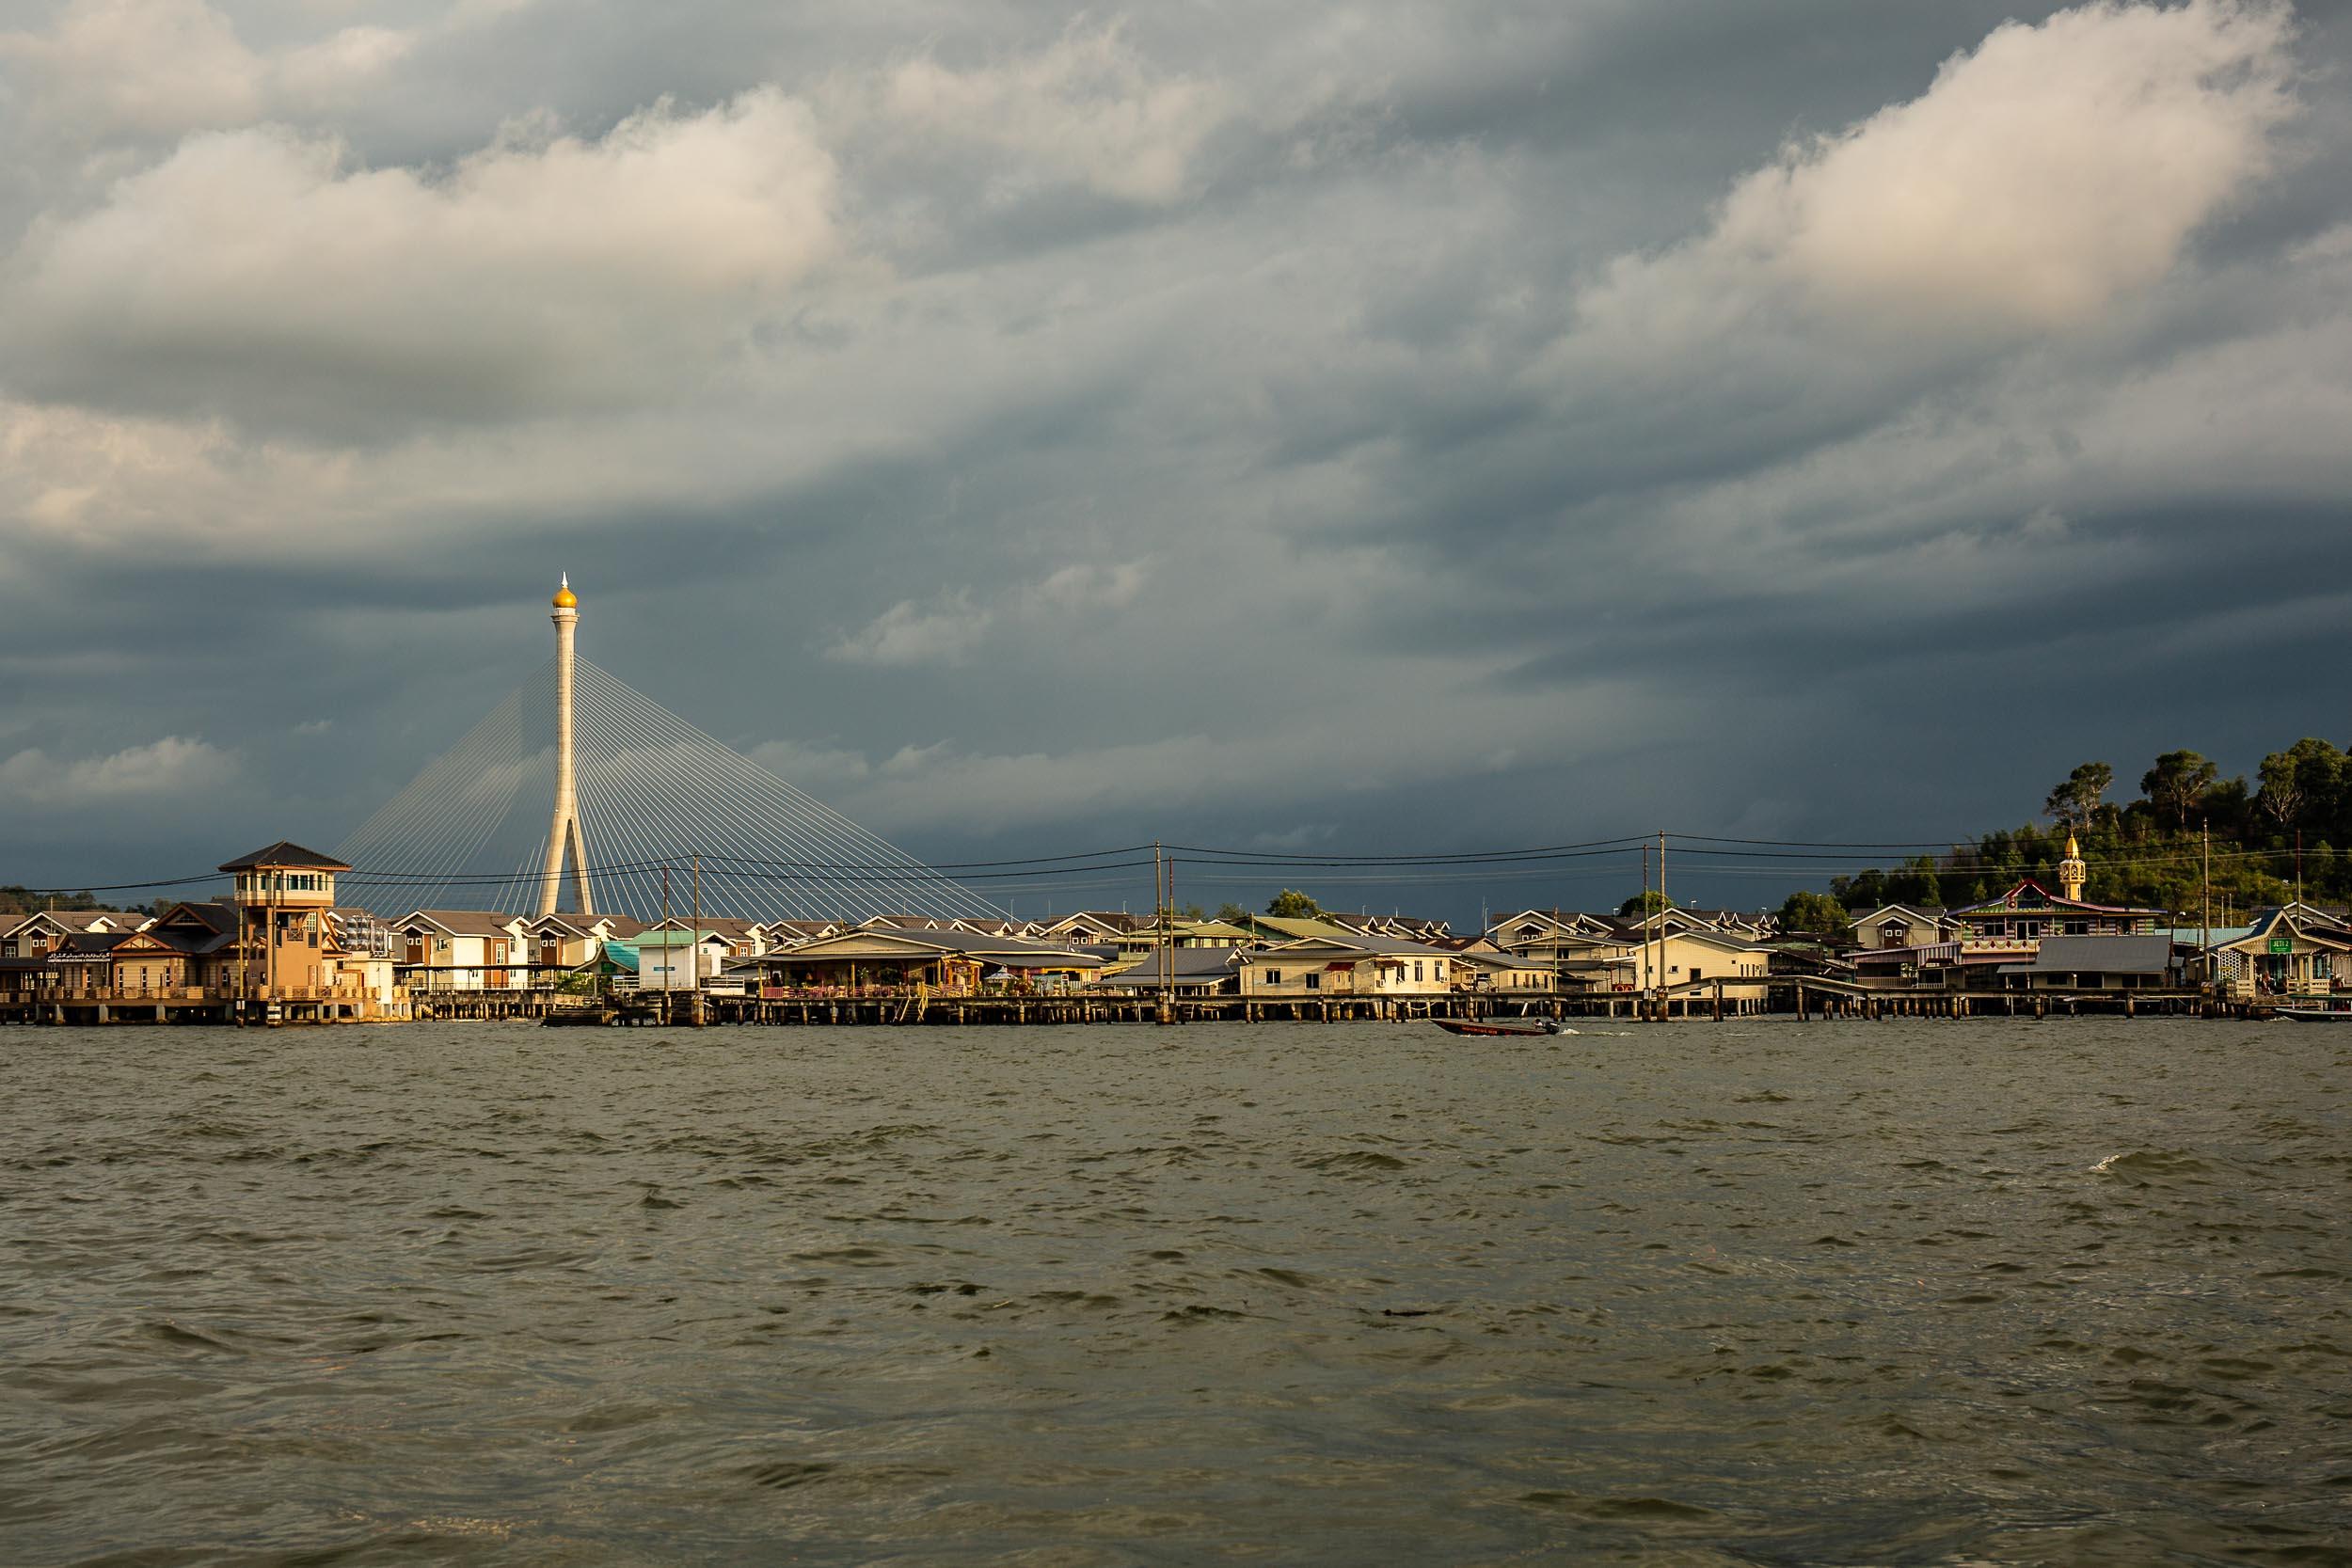 Kampong Ayer (Water Village) juxtaposed against the ultra-modern  Sungai Kebun Bridge , Bandar Seri Begawan